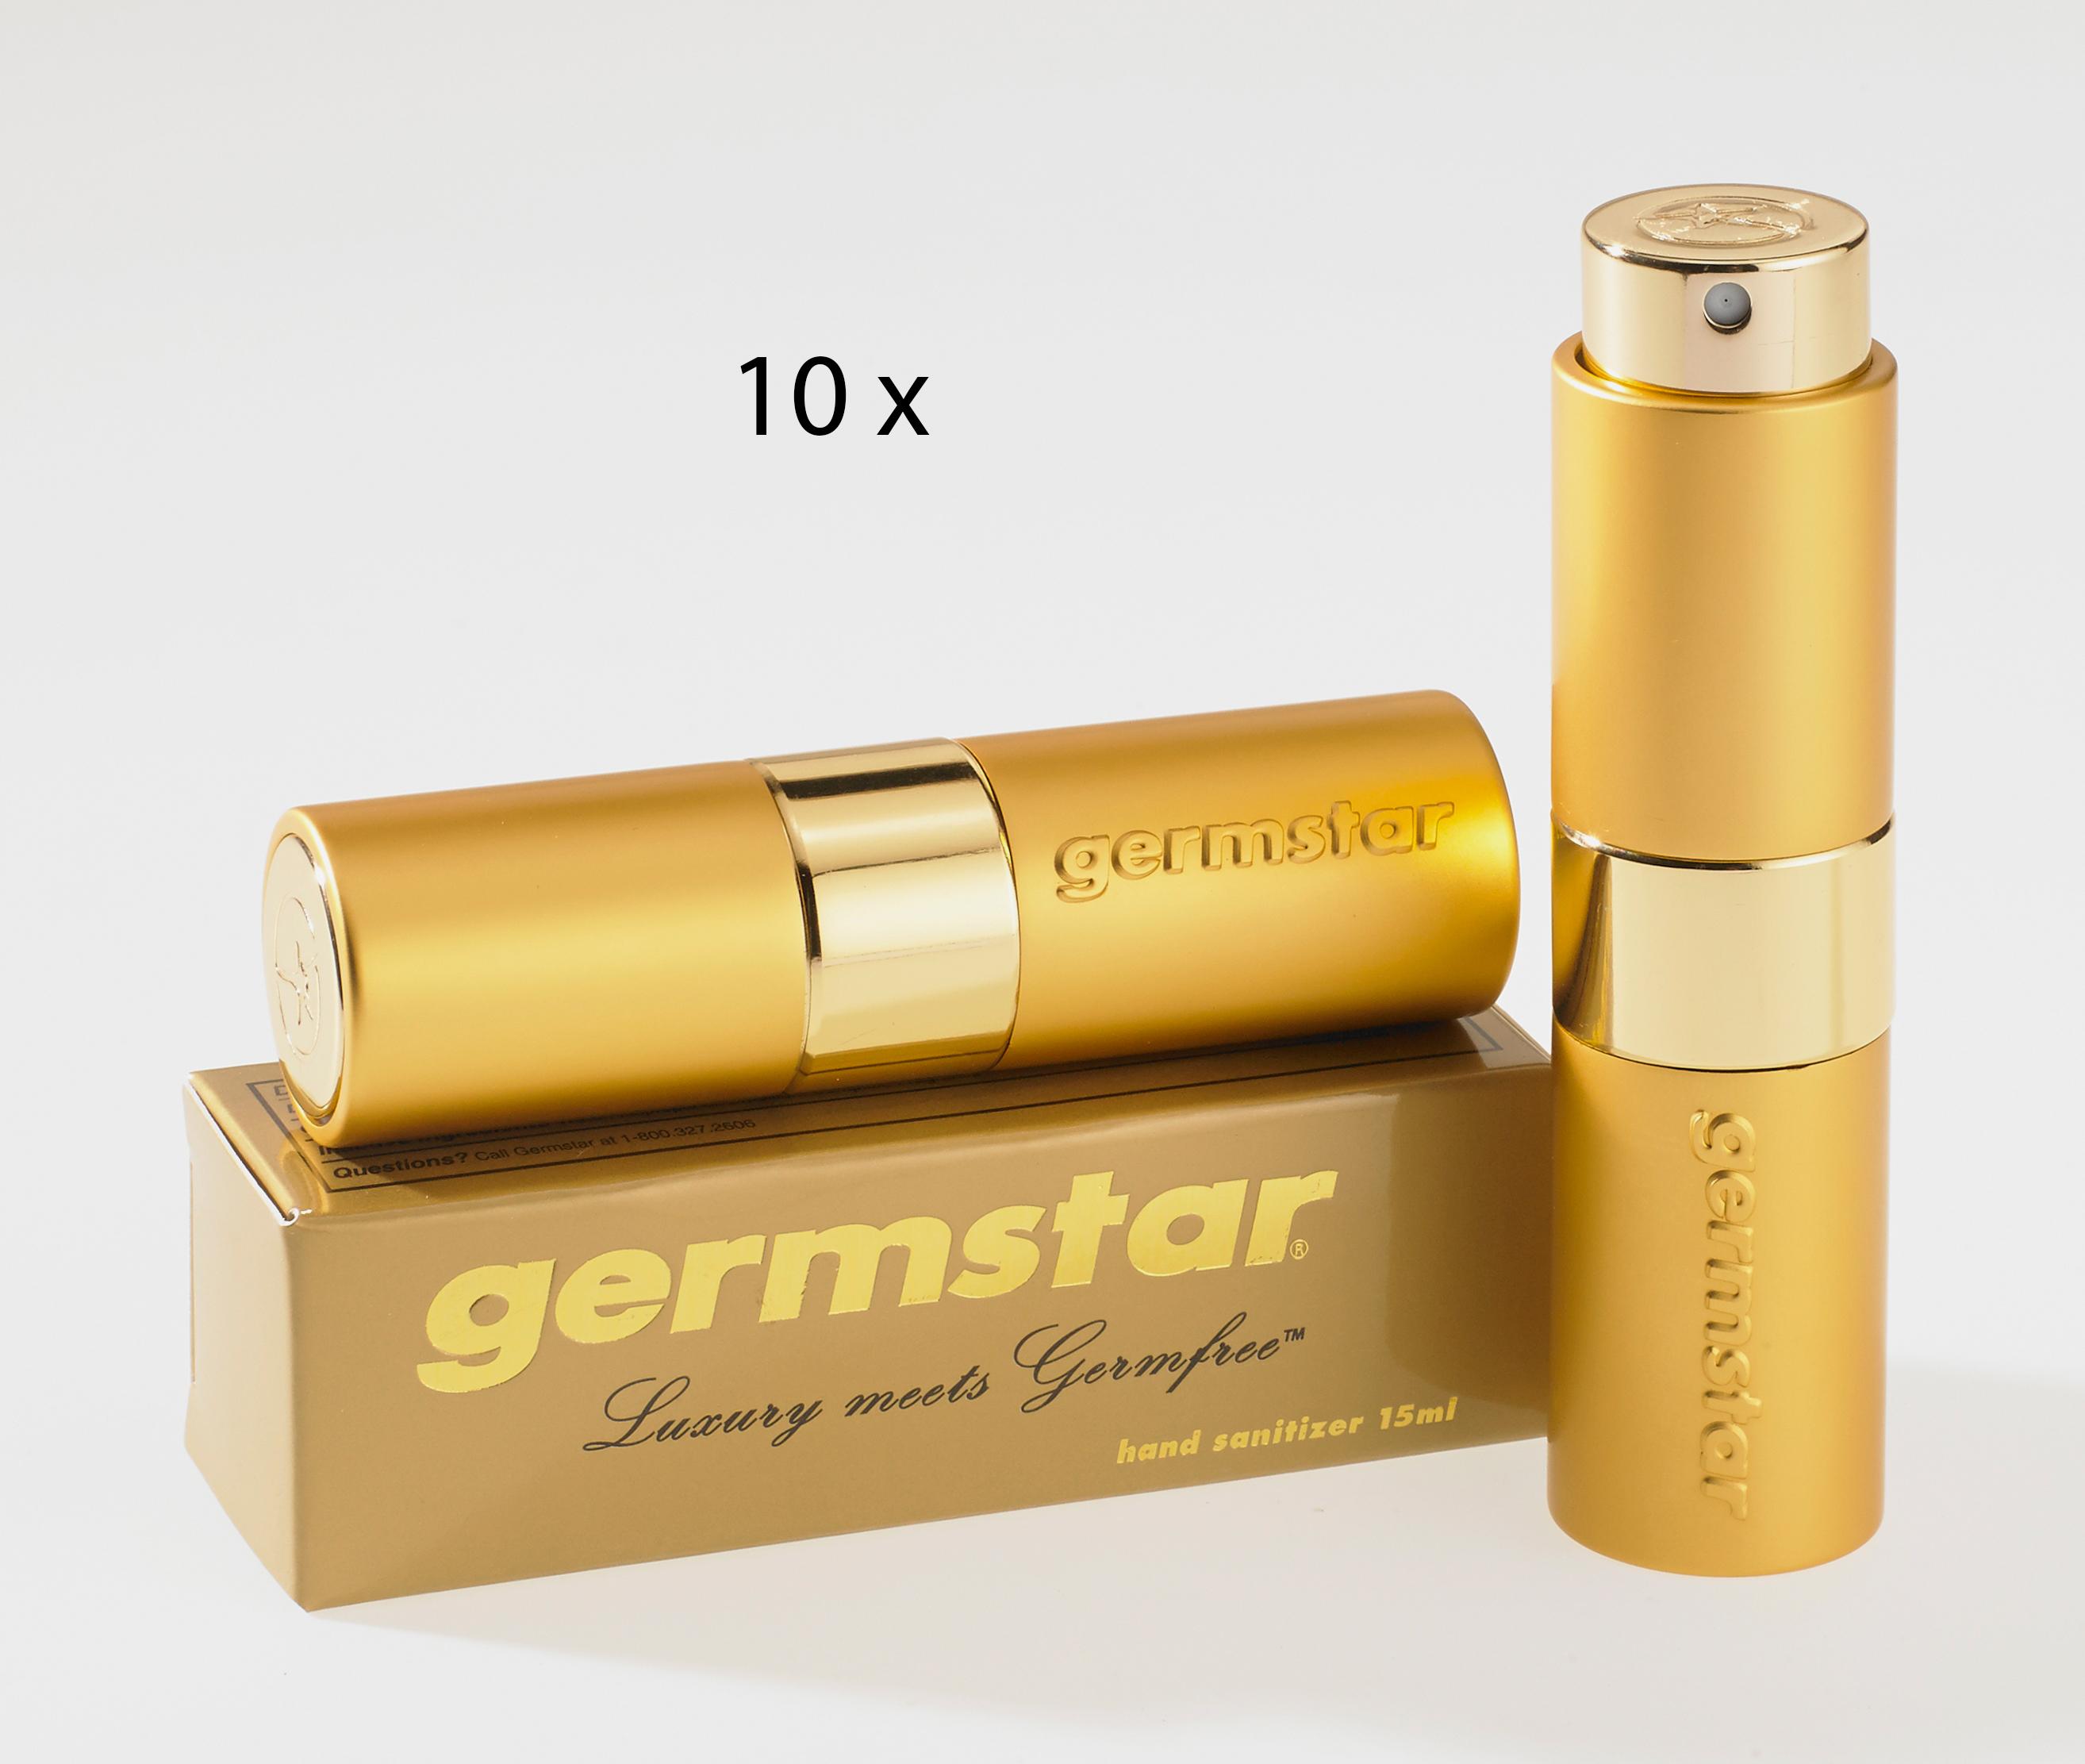 Luxe GOLD Spray (10) 10 Handspray à 15ml, Duft AQUA (UNISEX)